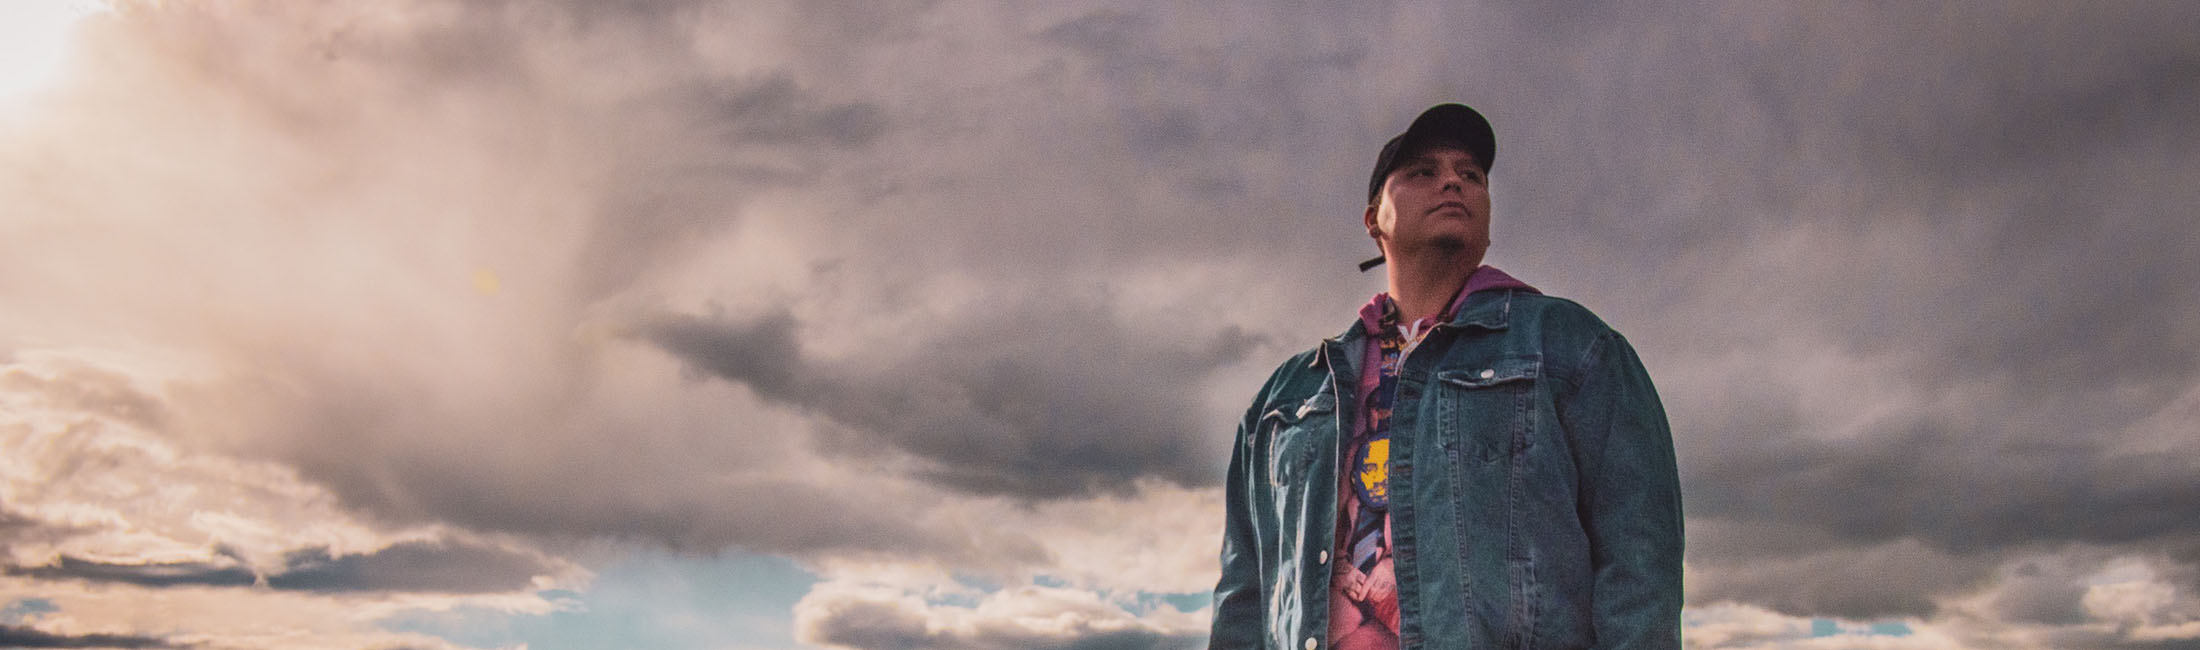 Salish and Blackfeet Hip Hop Artist Boosts COVID-19 Awareness Through Music